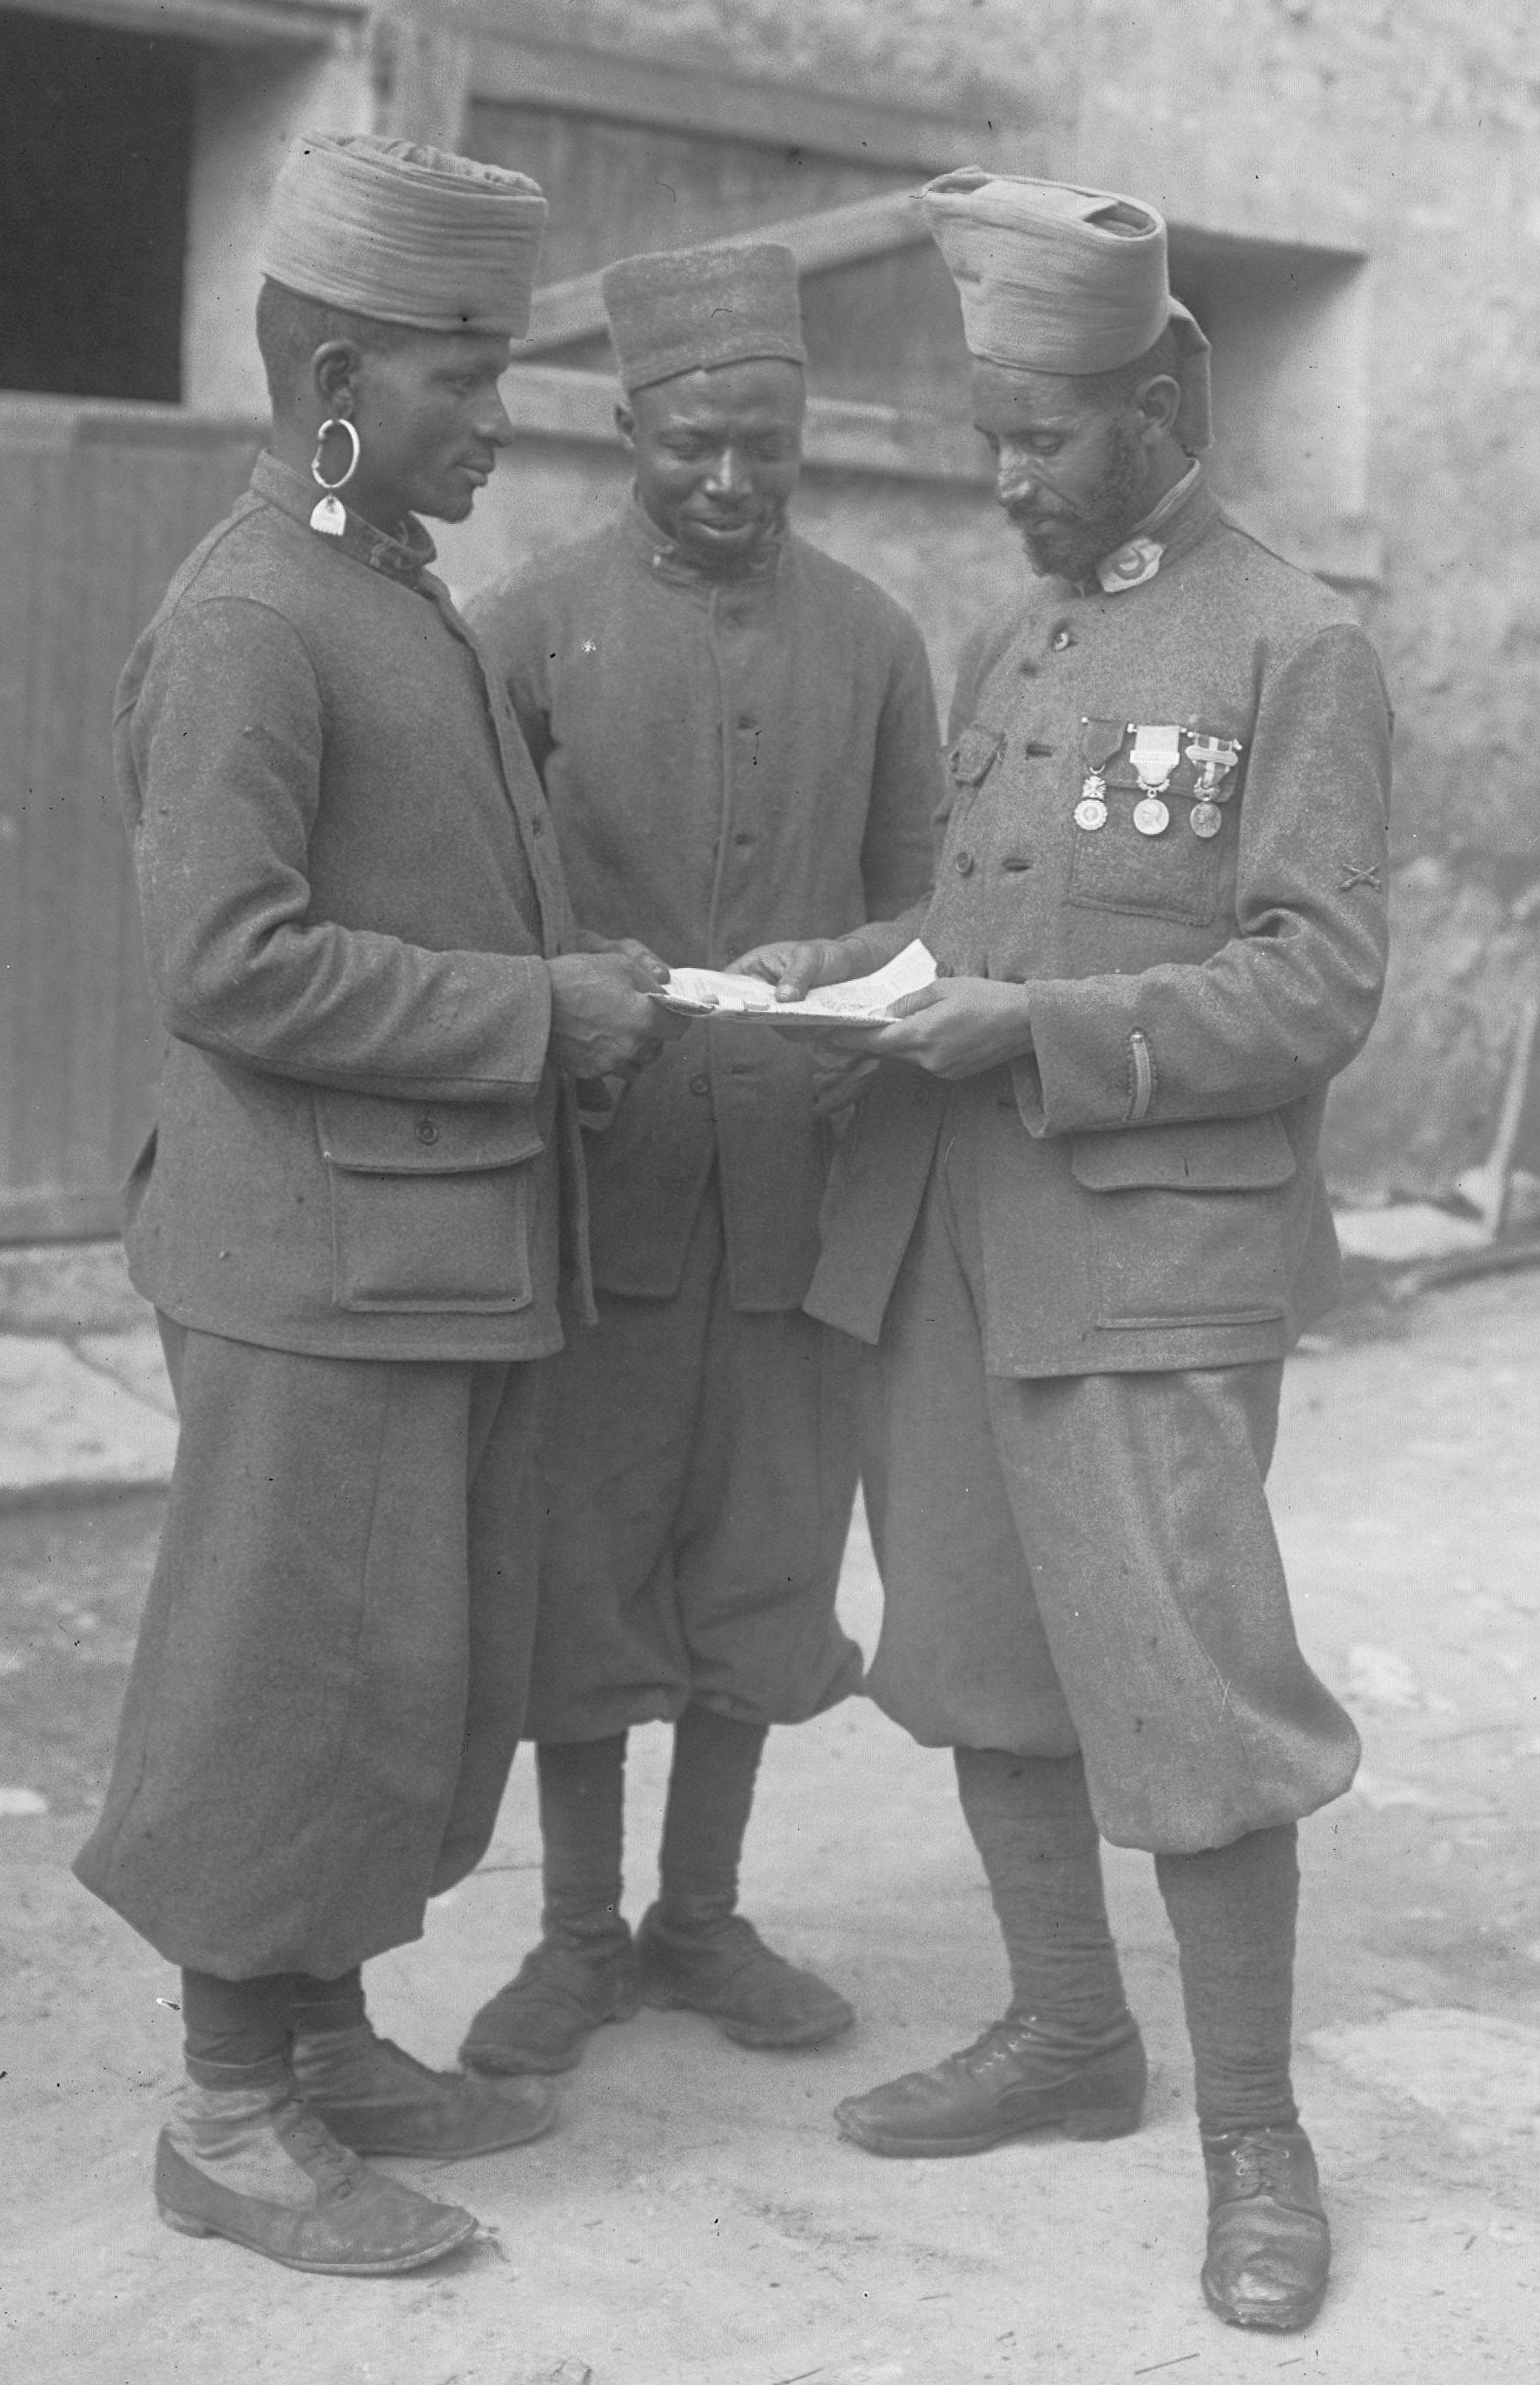 http://upload.wikimedia.org/wikipedia/commons/d/d7/Soldats_marocains_tenant_une_main_de_Fatma_1915.jpg